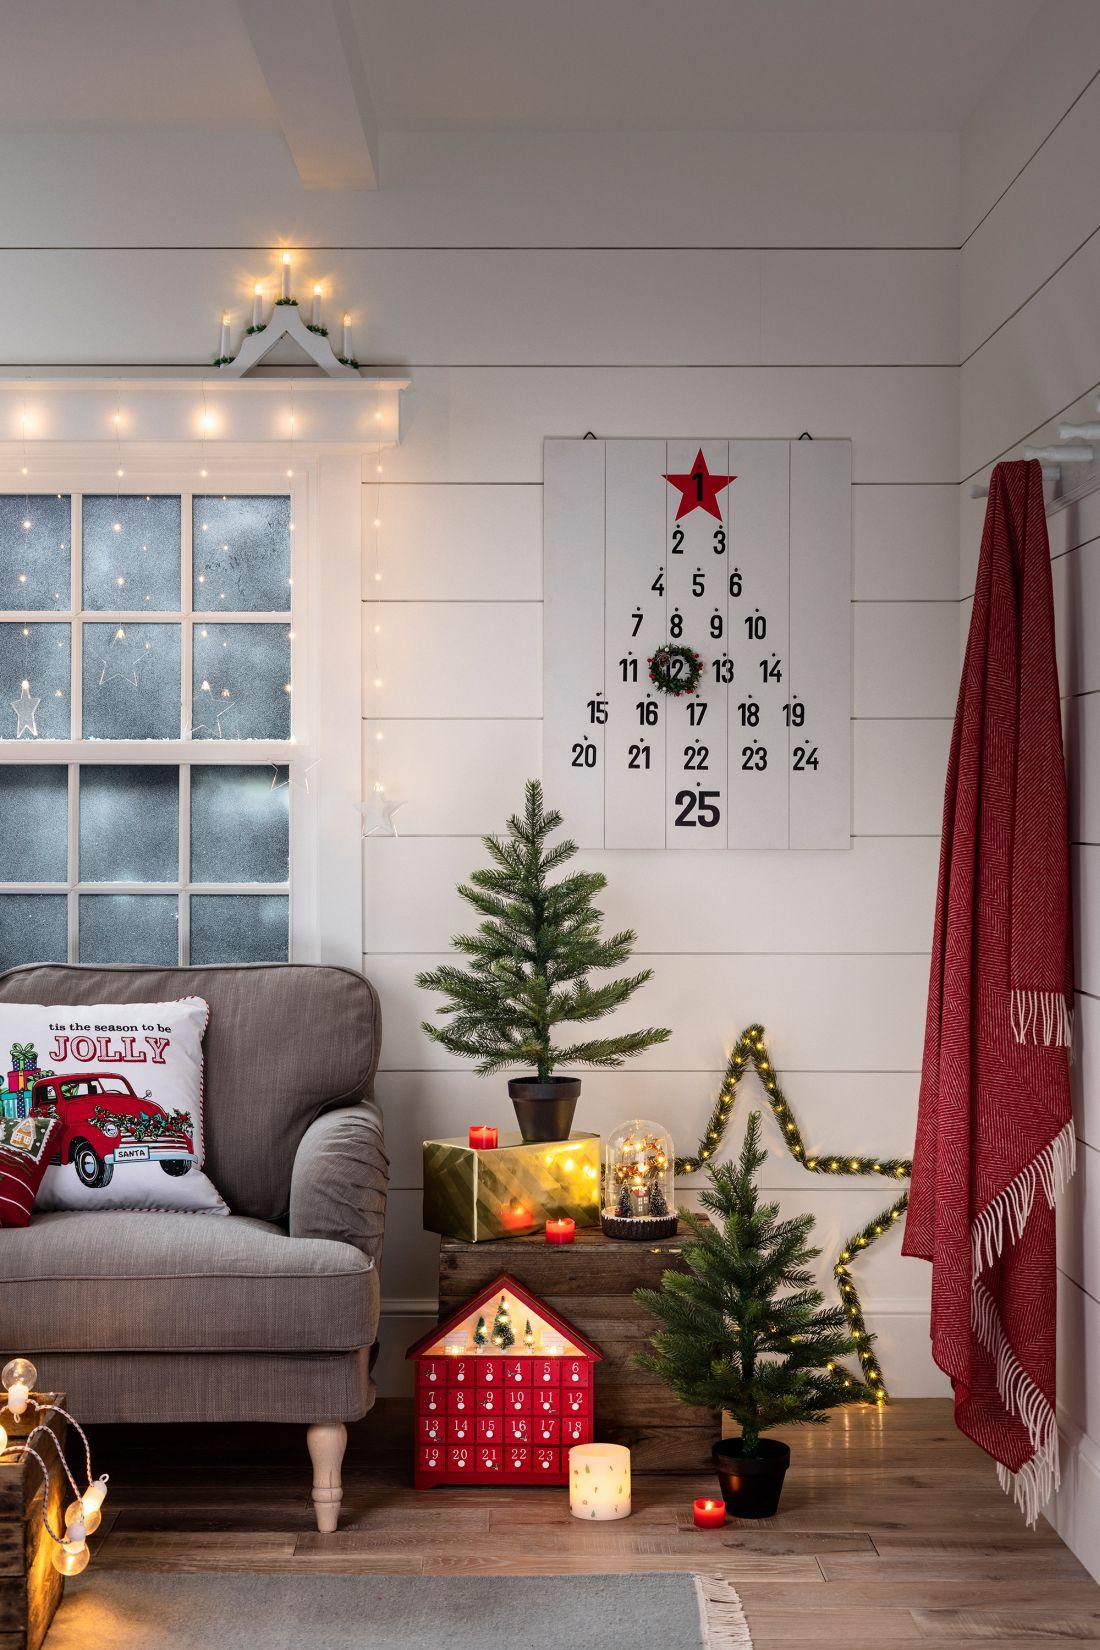 7lights4fun_jolly-holidays-collection-2018.jpg